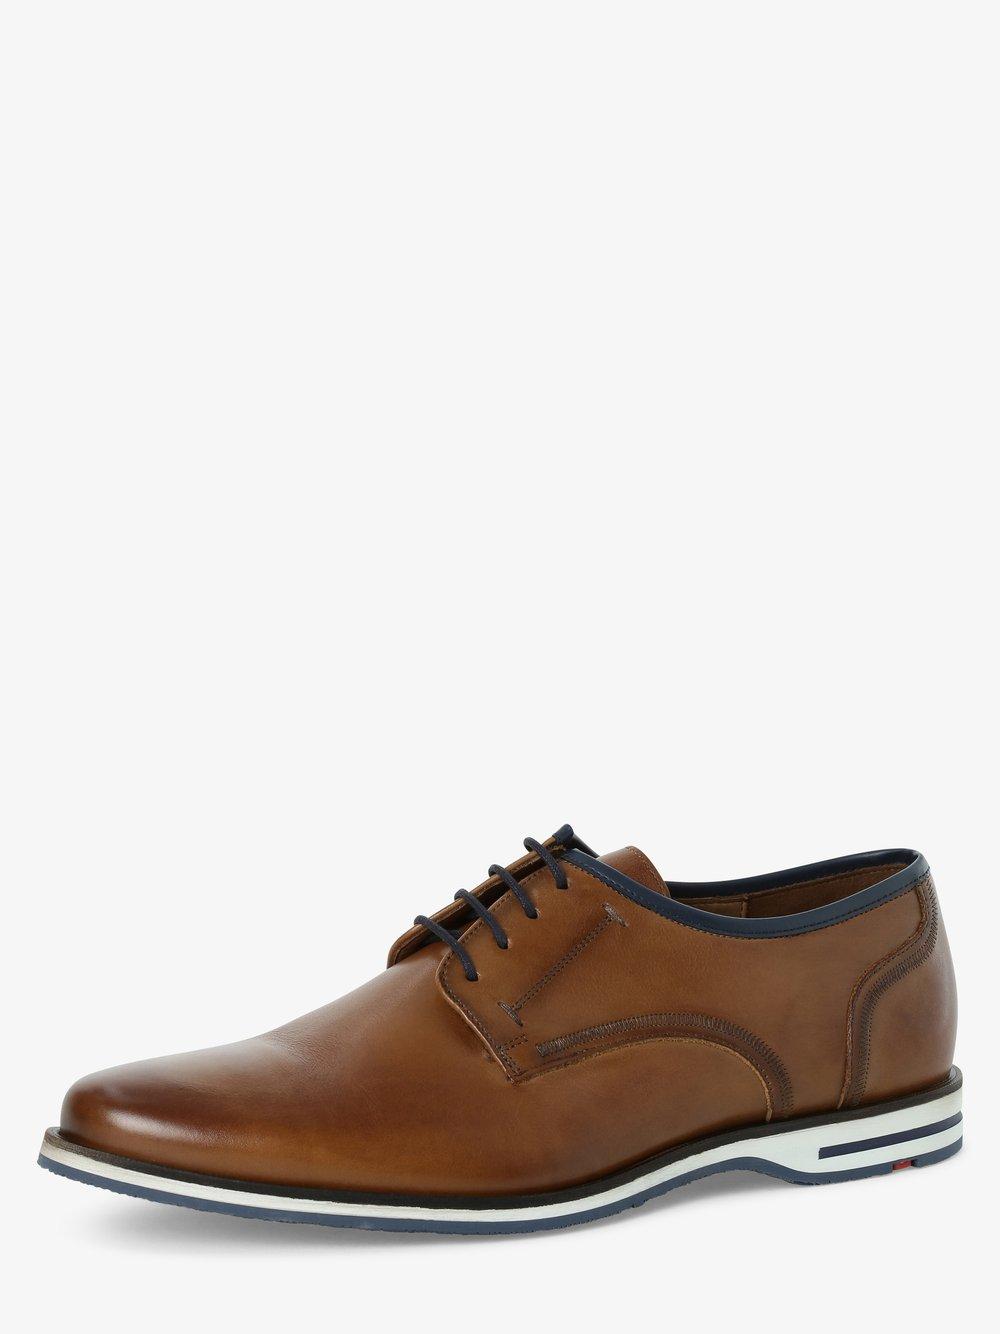 Lloyd – Męskie buty sznurowane ze skóry – Detroit, beżowy Van Graaf 468877-0001-00110